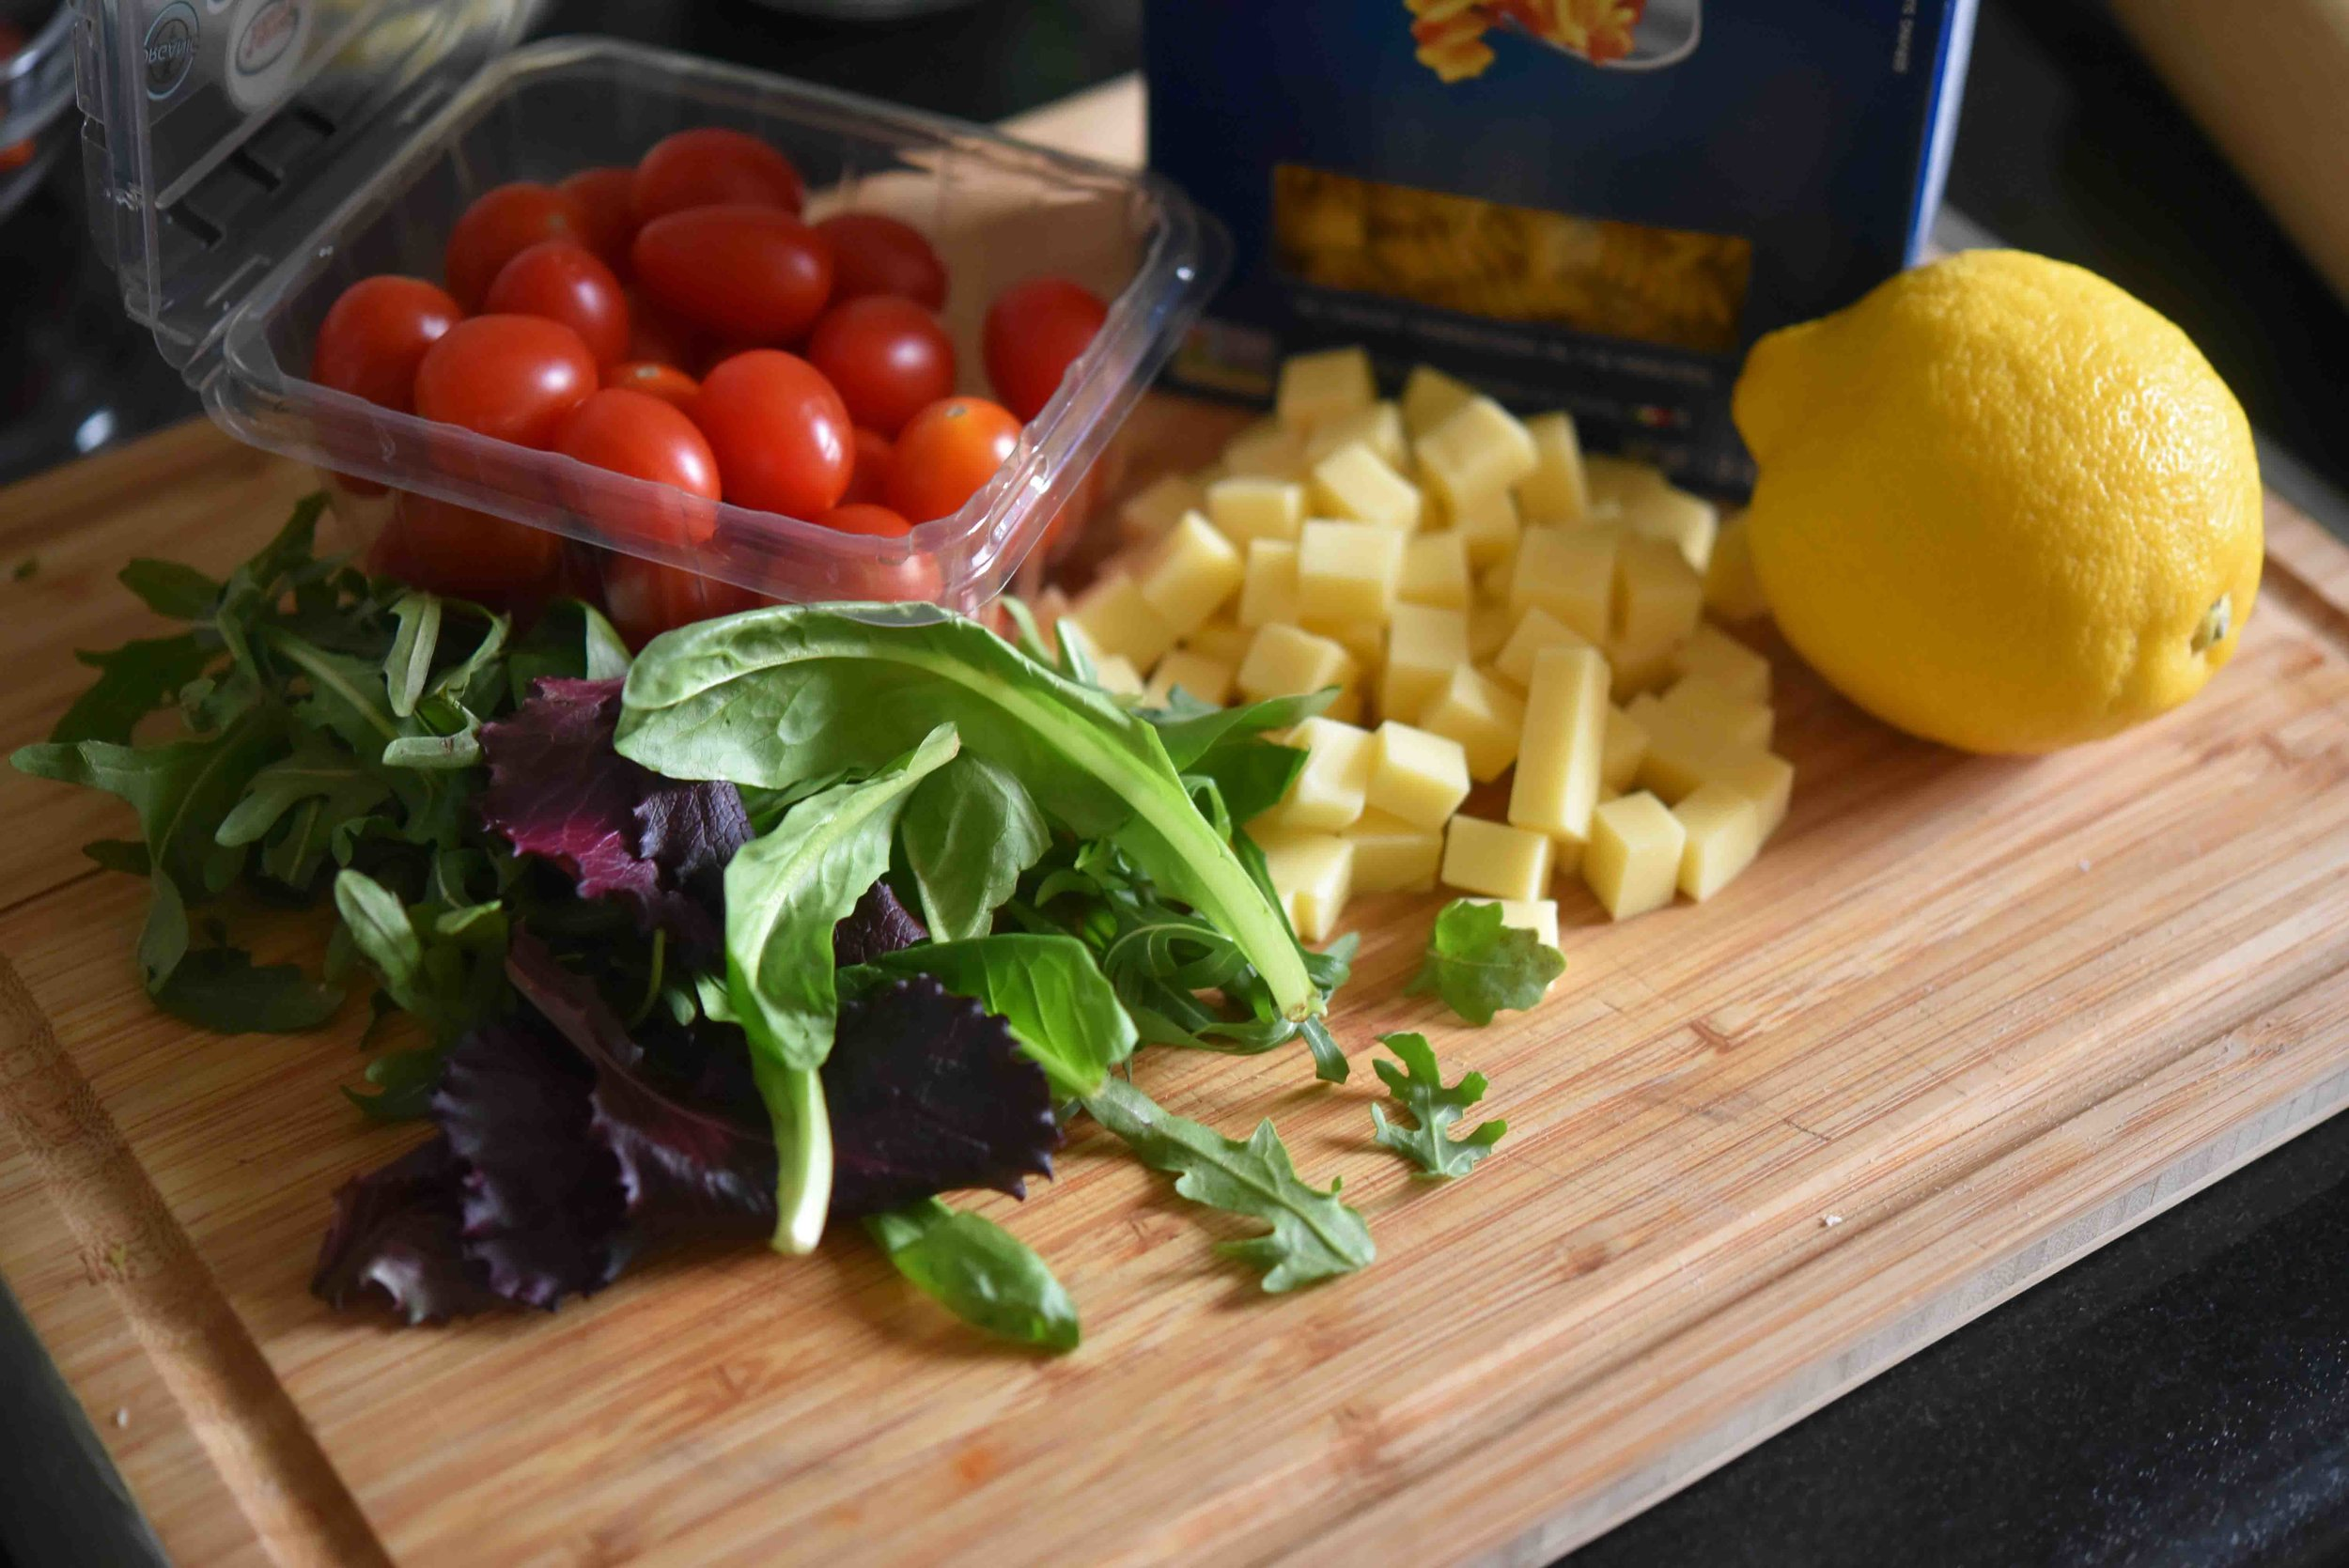 Tomato Cheddar Lemon Aioli Pasta Salad 2.jpg